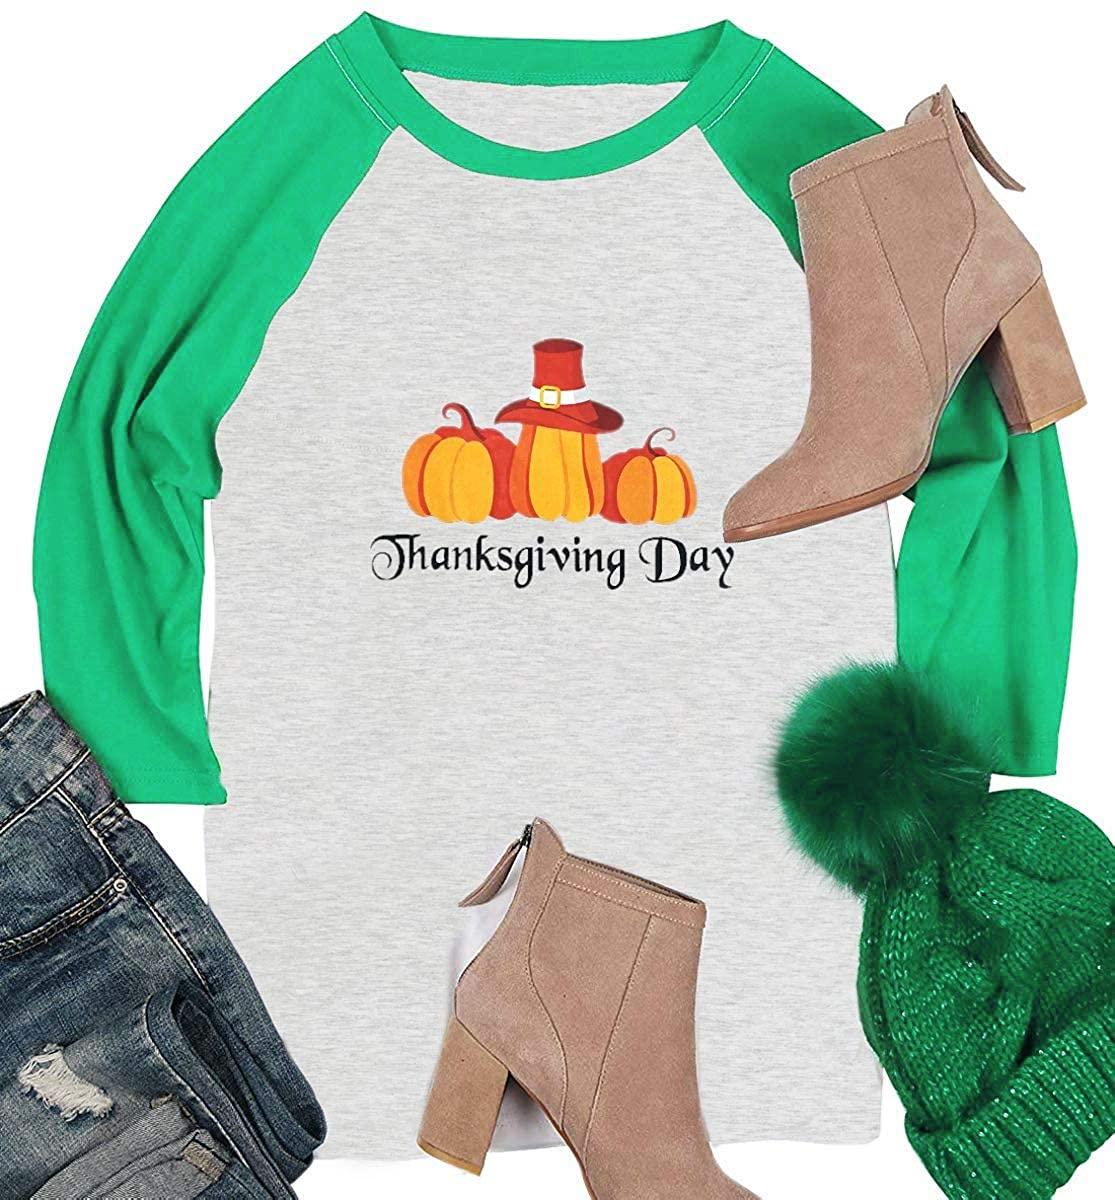 Women's Thanksgiving Day T-Shirt Letter Print Pumpkin Graphic Tee Shirt Casual Fall Winter Tee Top